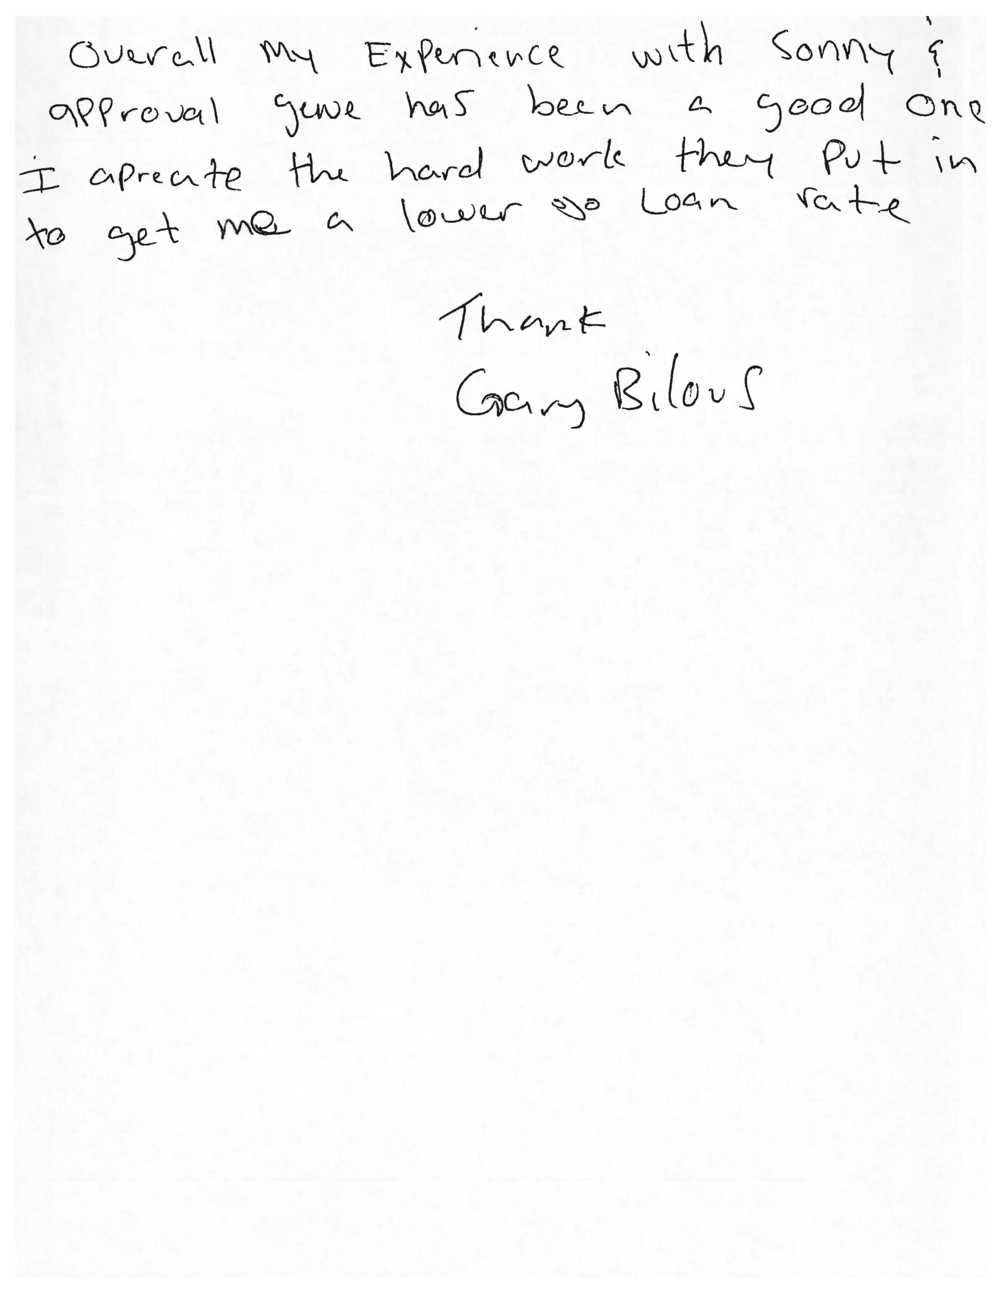 Gary Bilous_Testimonial.jpg